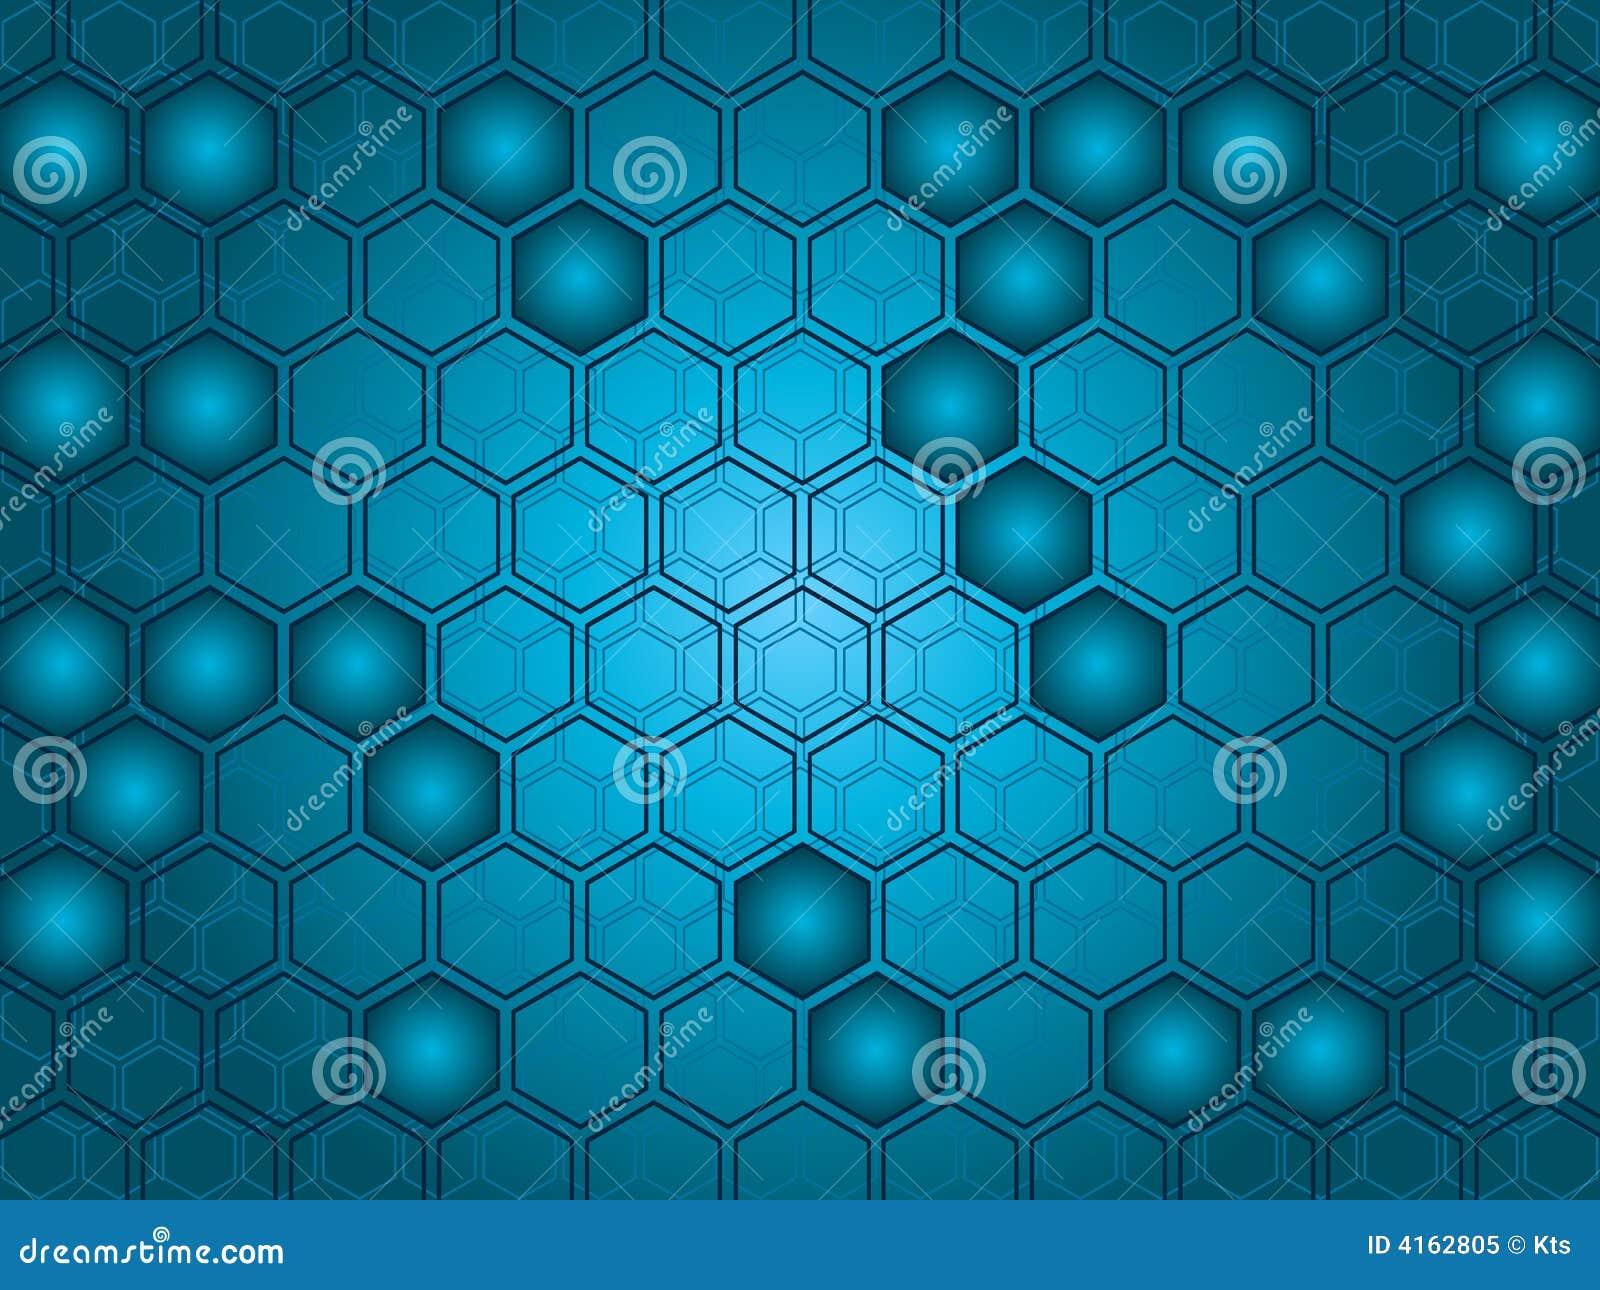 3d hexagon pattern stock vector image 54997696 - Hexagon Vector Wallpaper 3d Hexagon Pattern Stock Vector Image 54997696